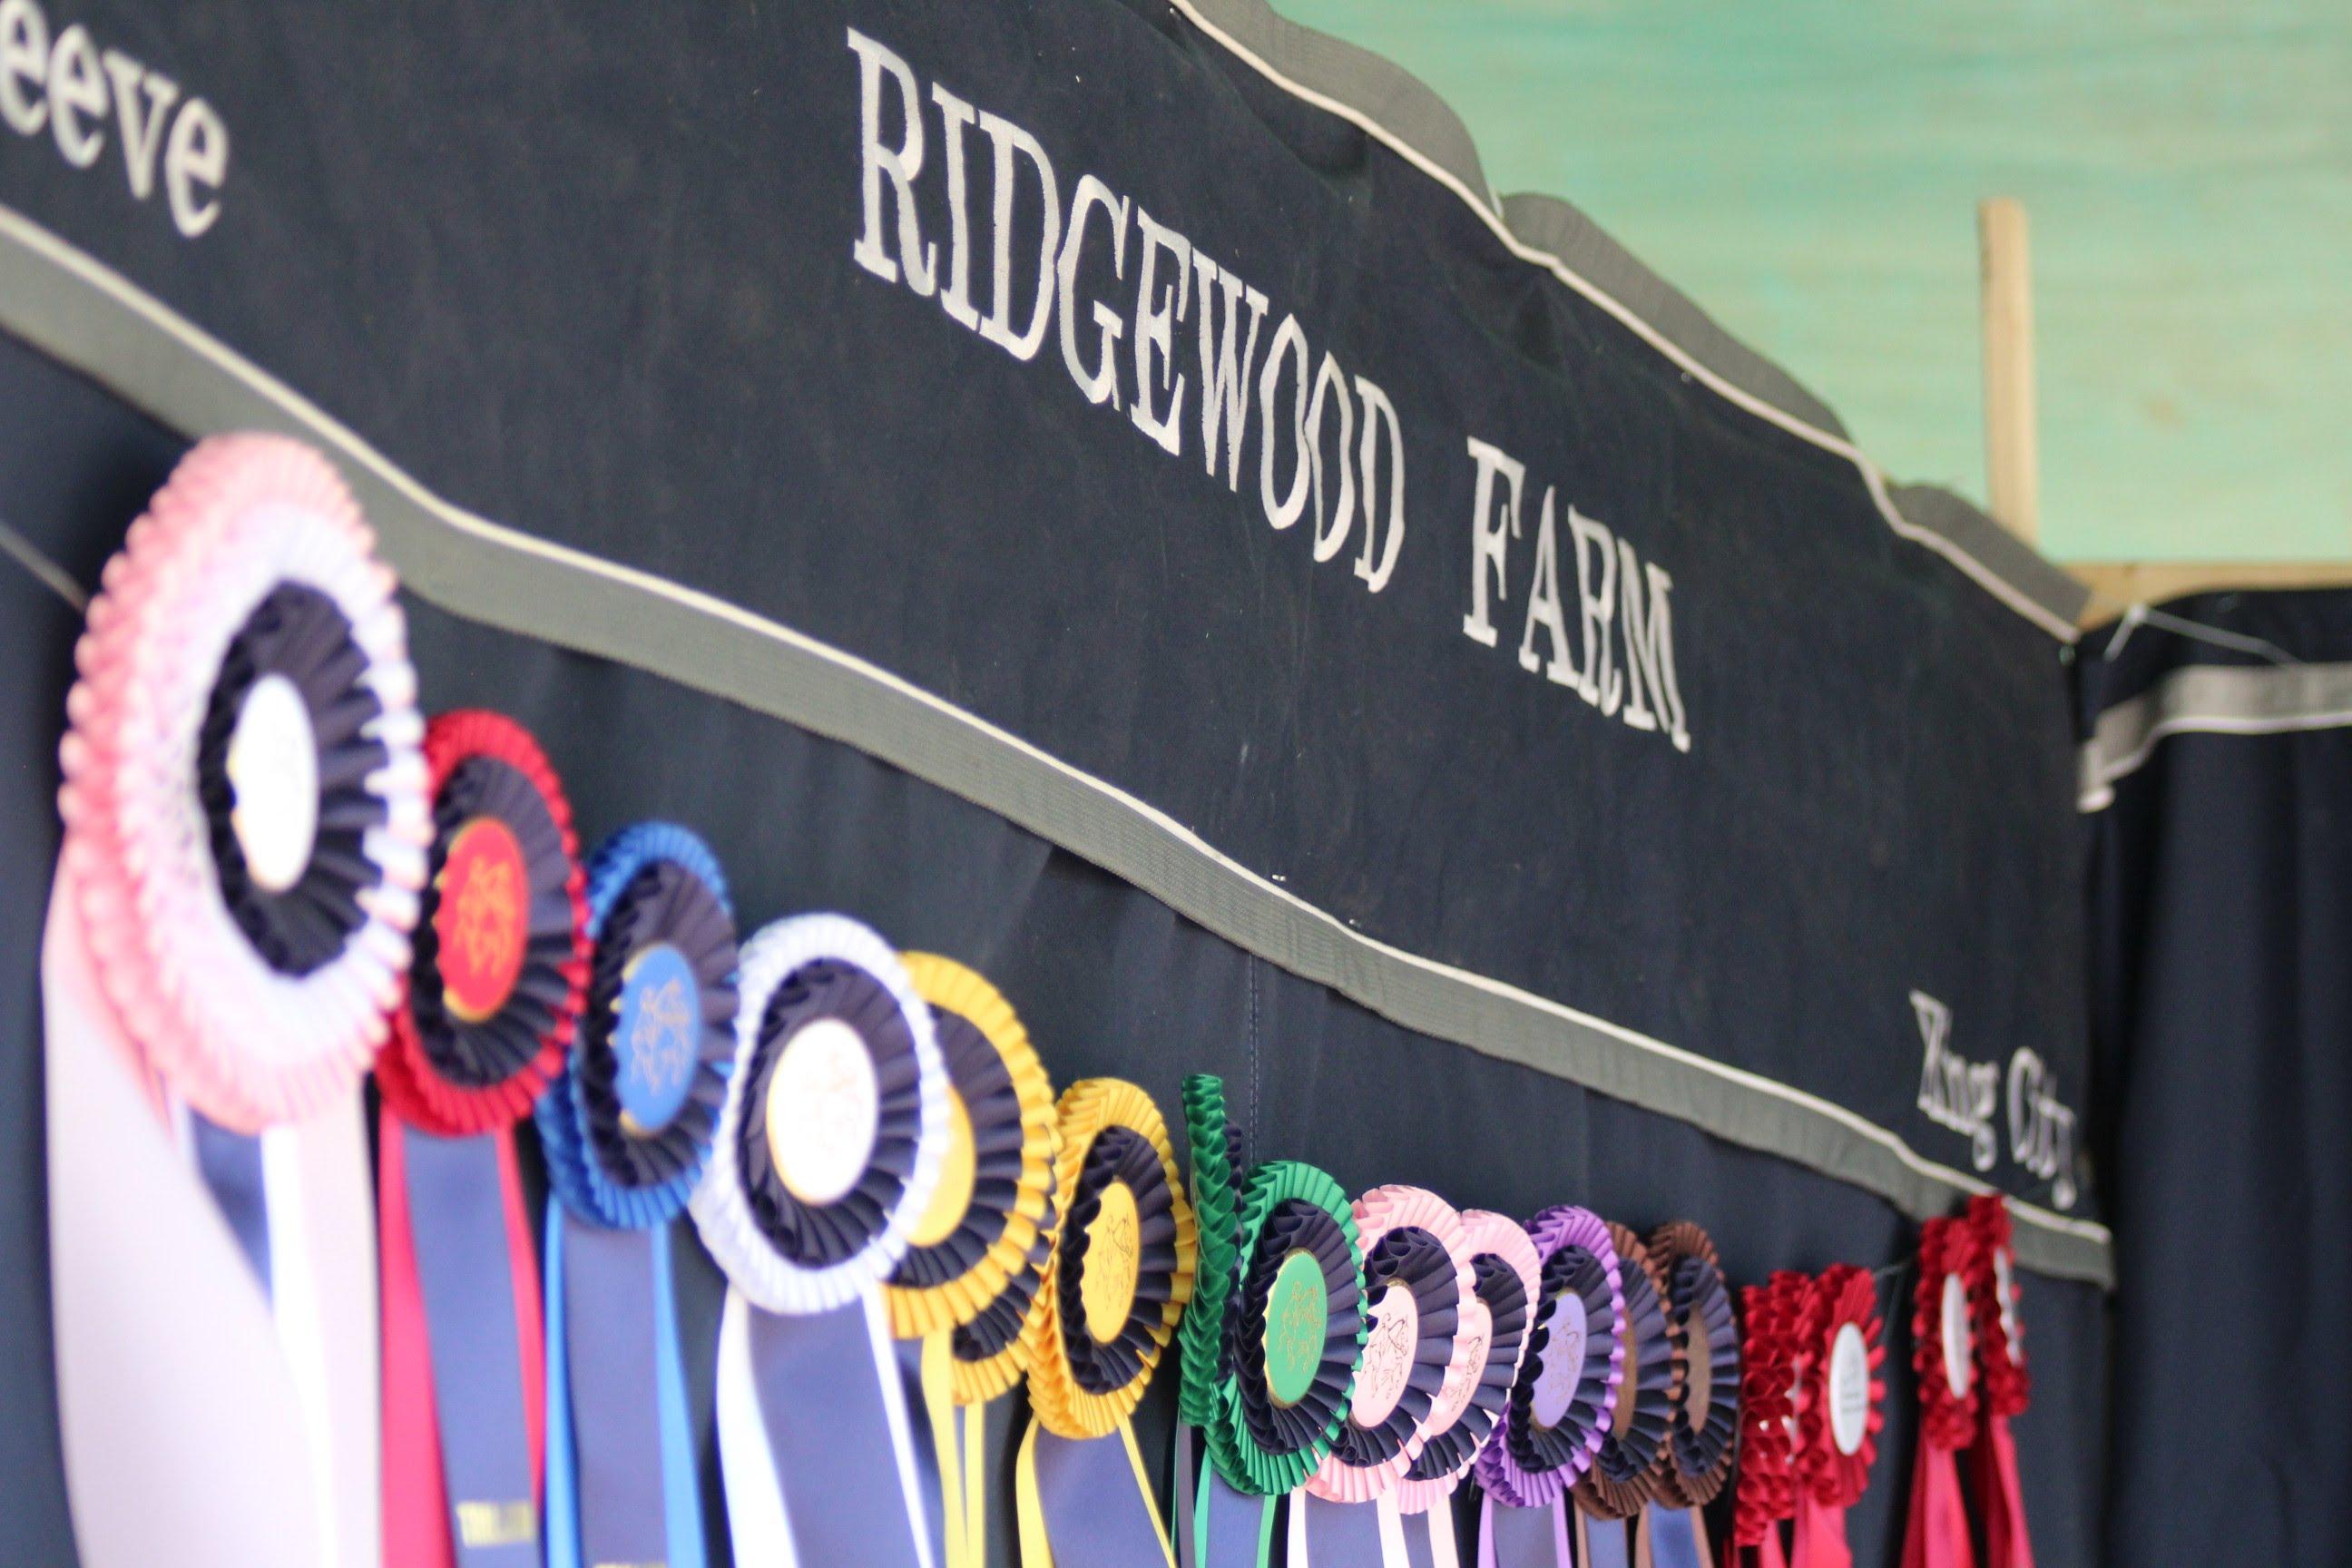 Ridgewood Ribbons